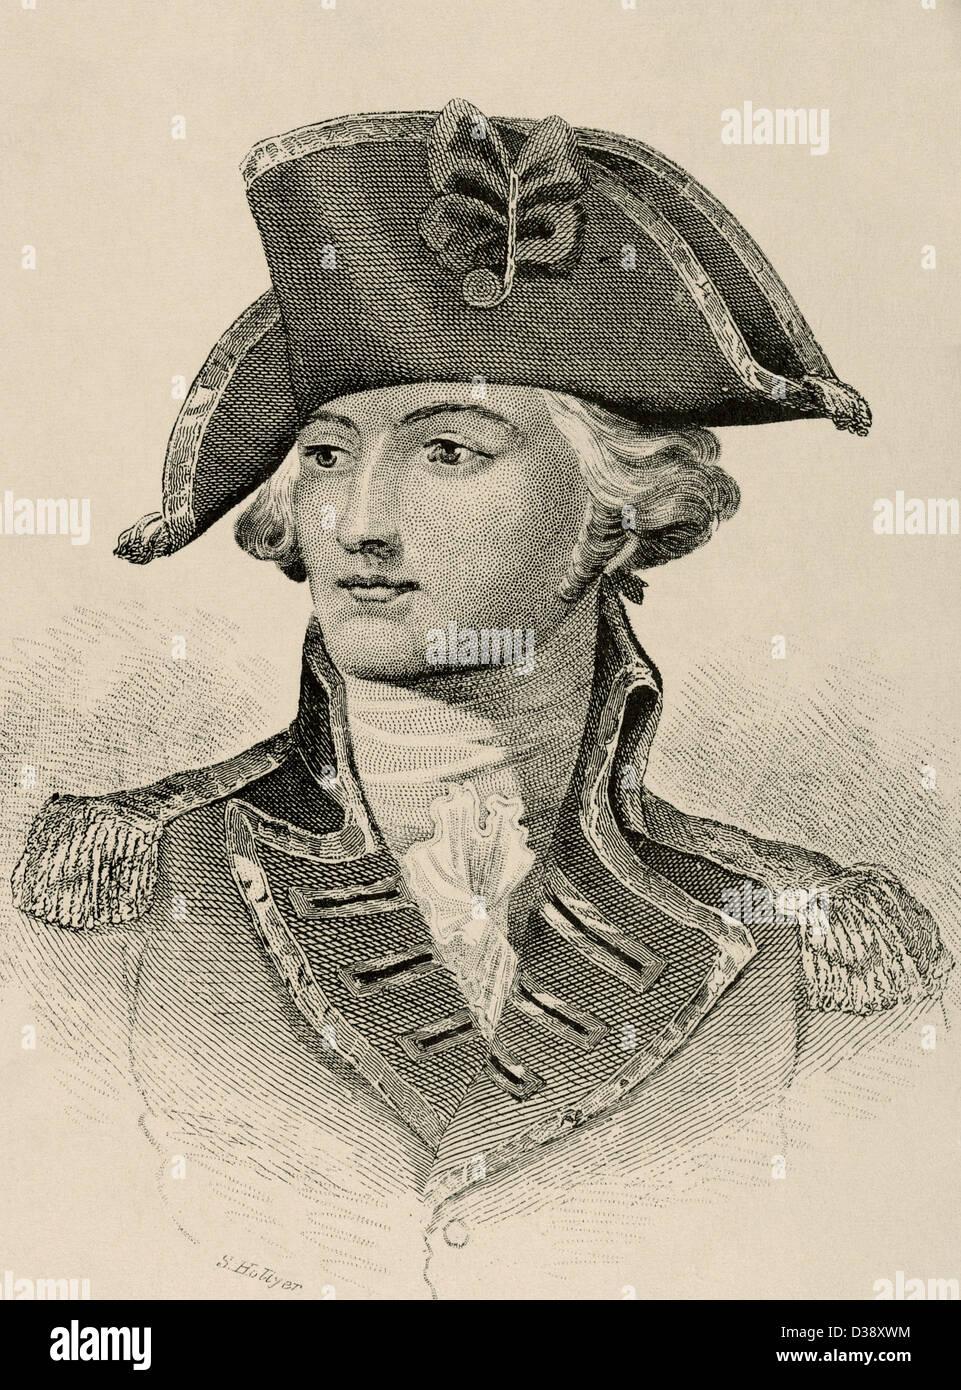 John Burgoyne (1722-1792). British General and playwright. Engraving in The American Revolution. - Stock Image